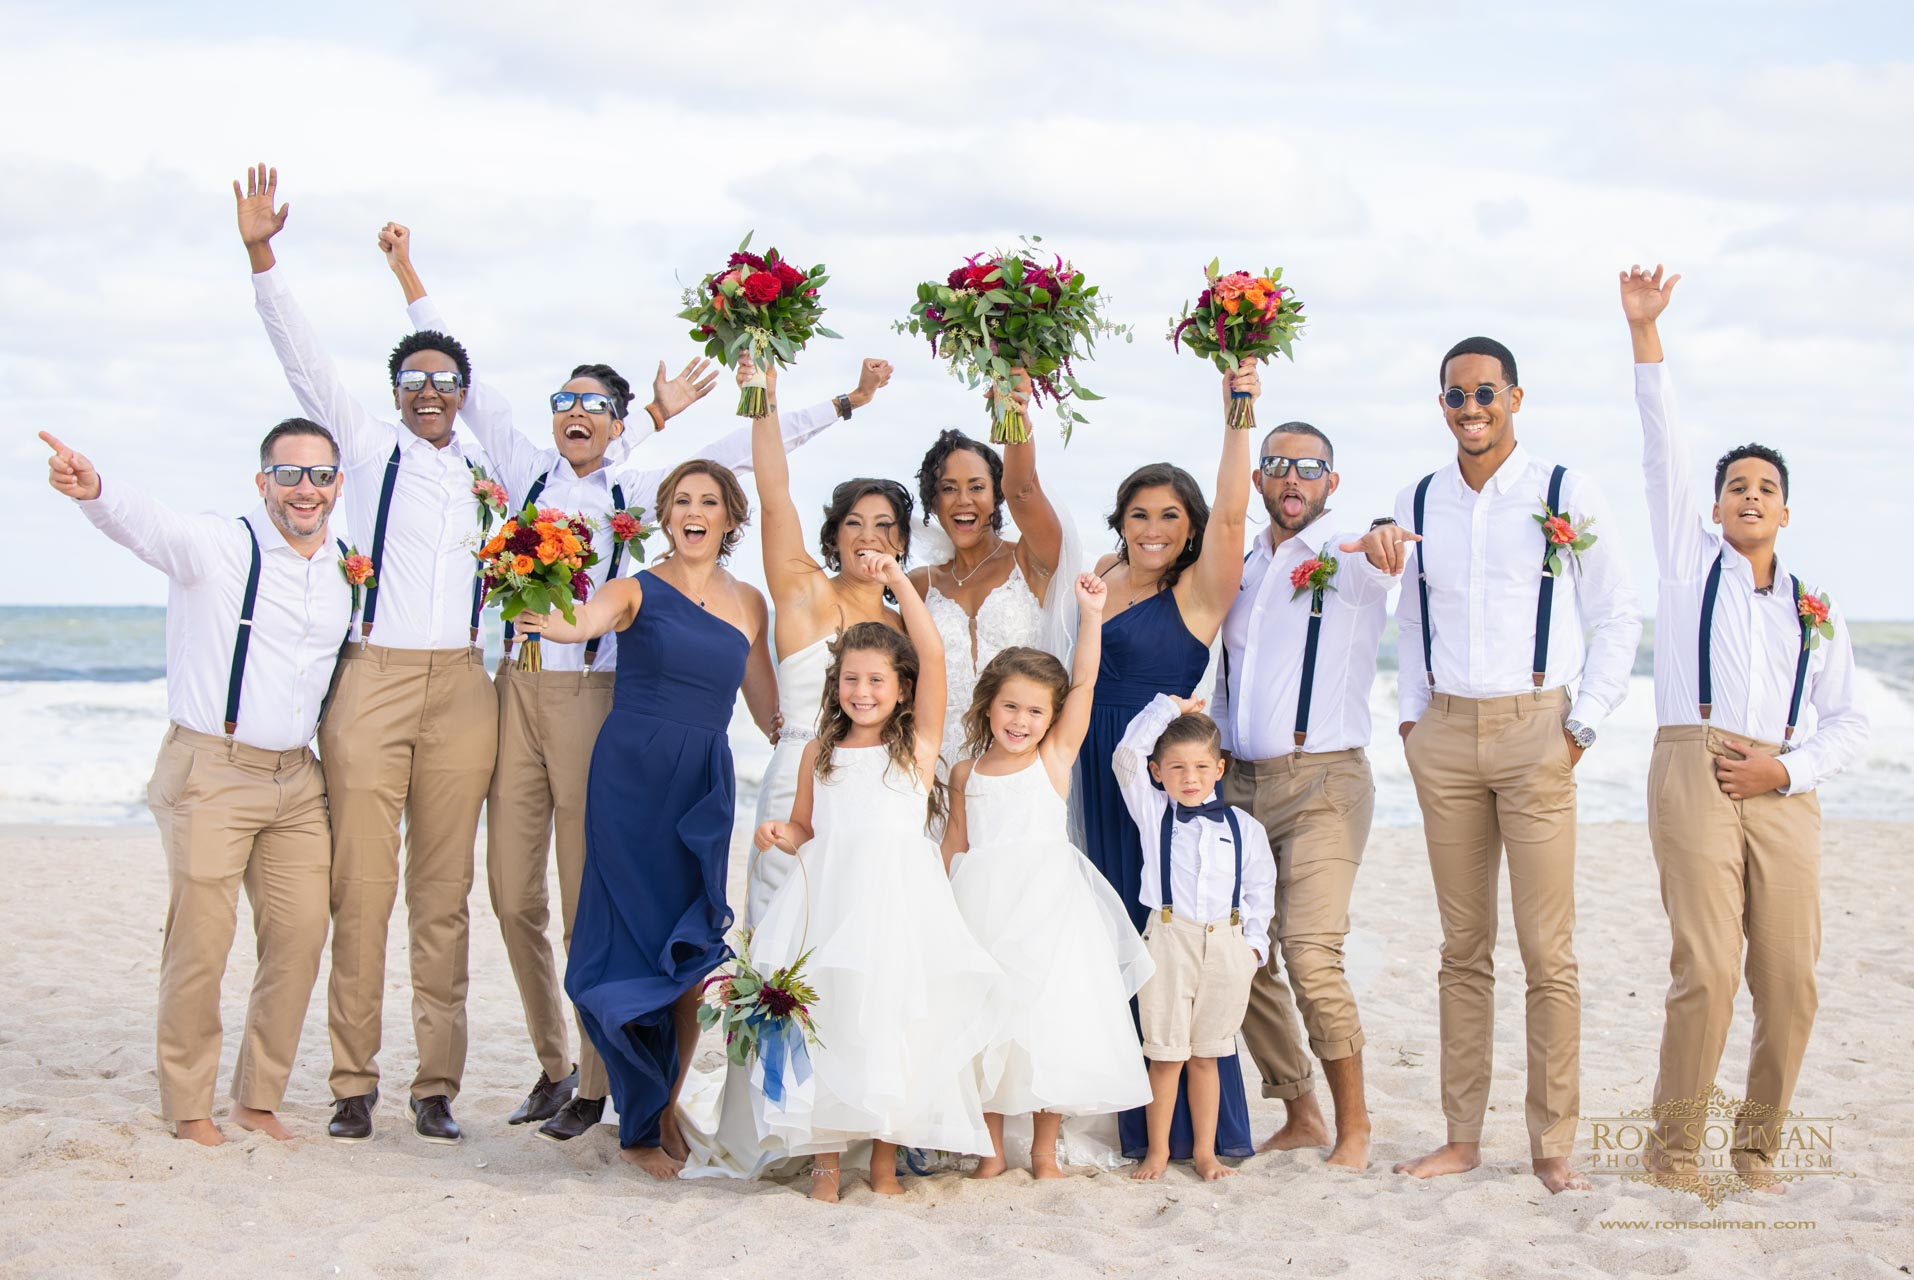 NEW JERSEY BEACH WEDDING 19